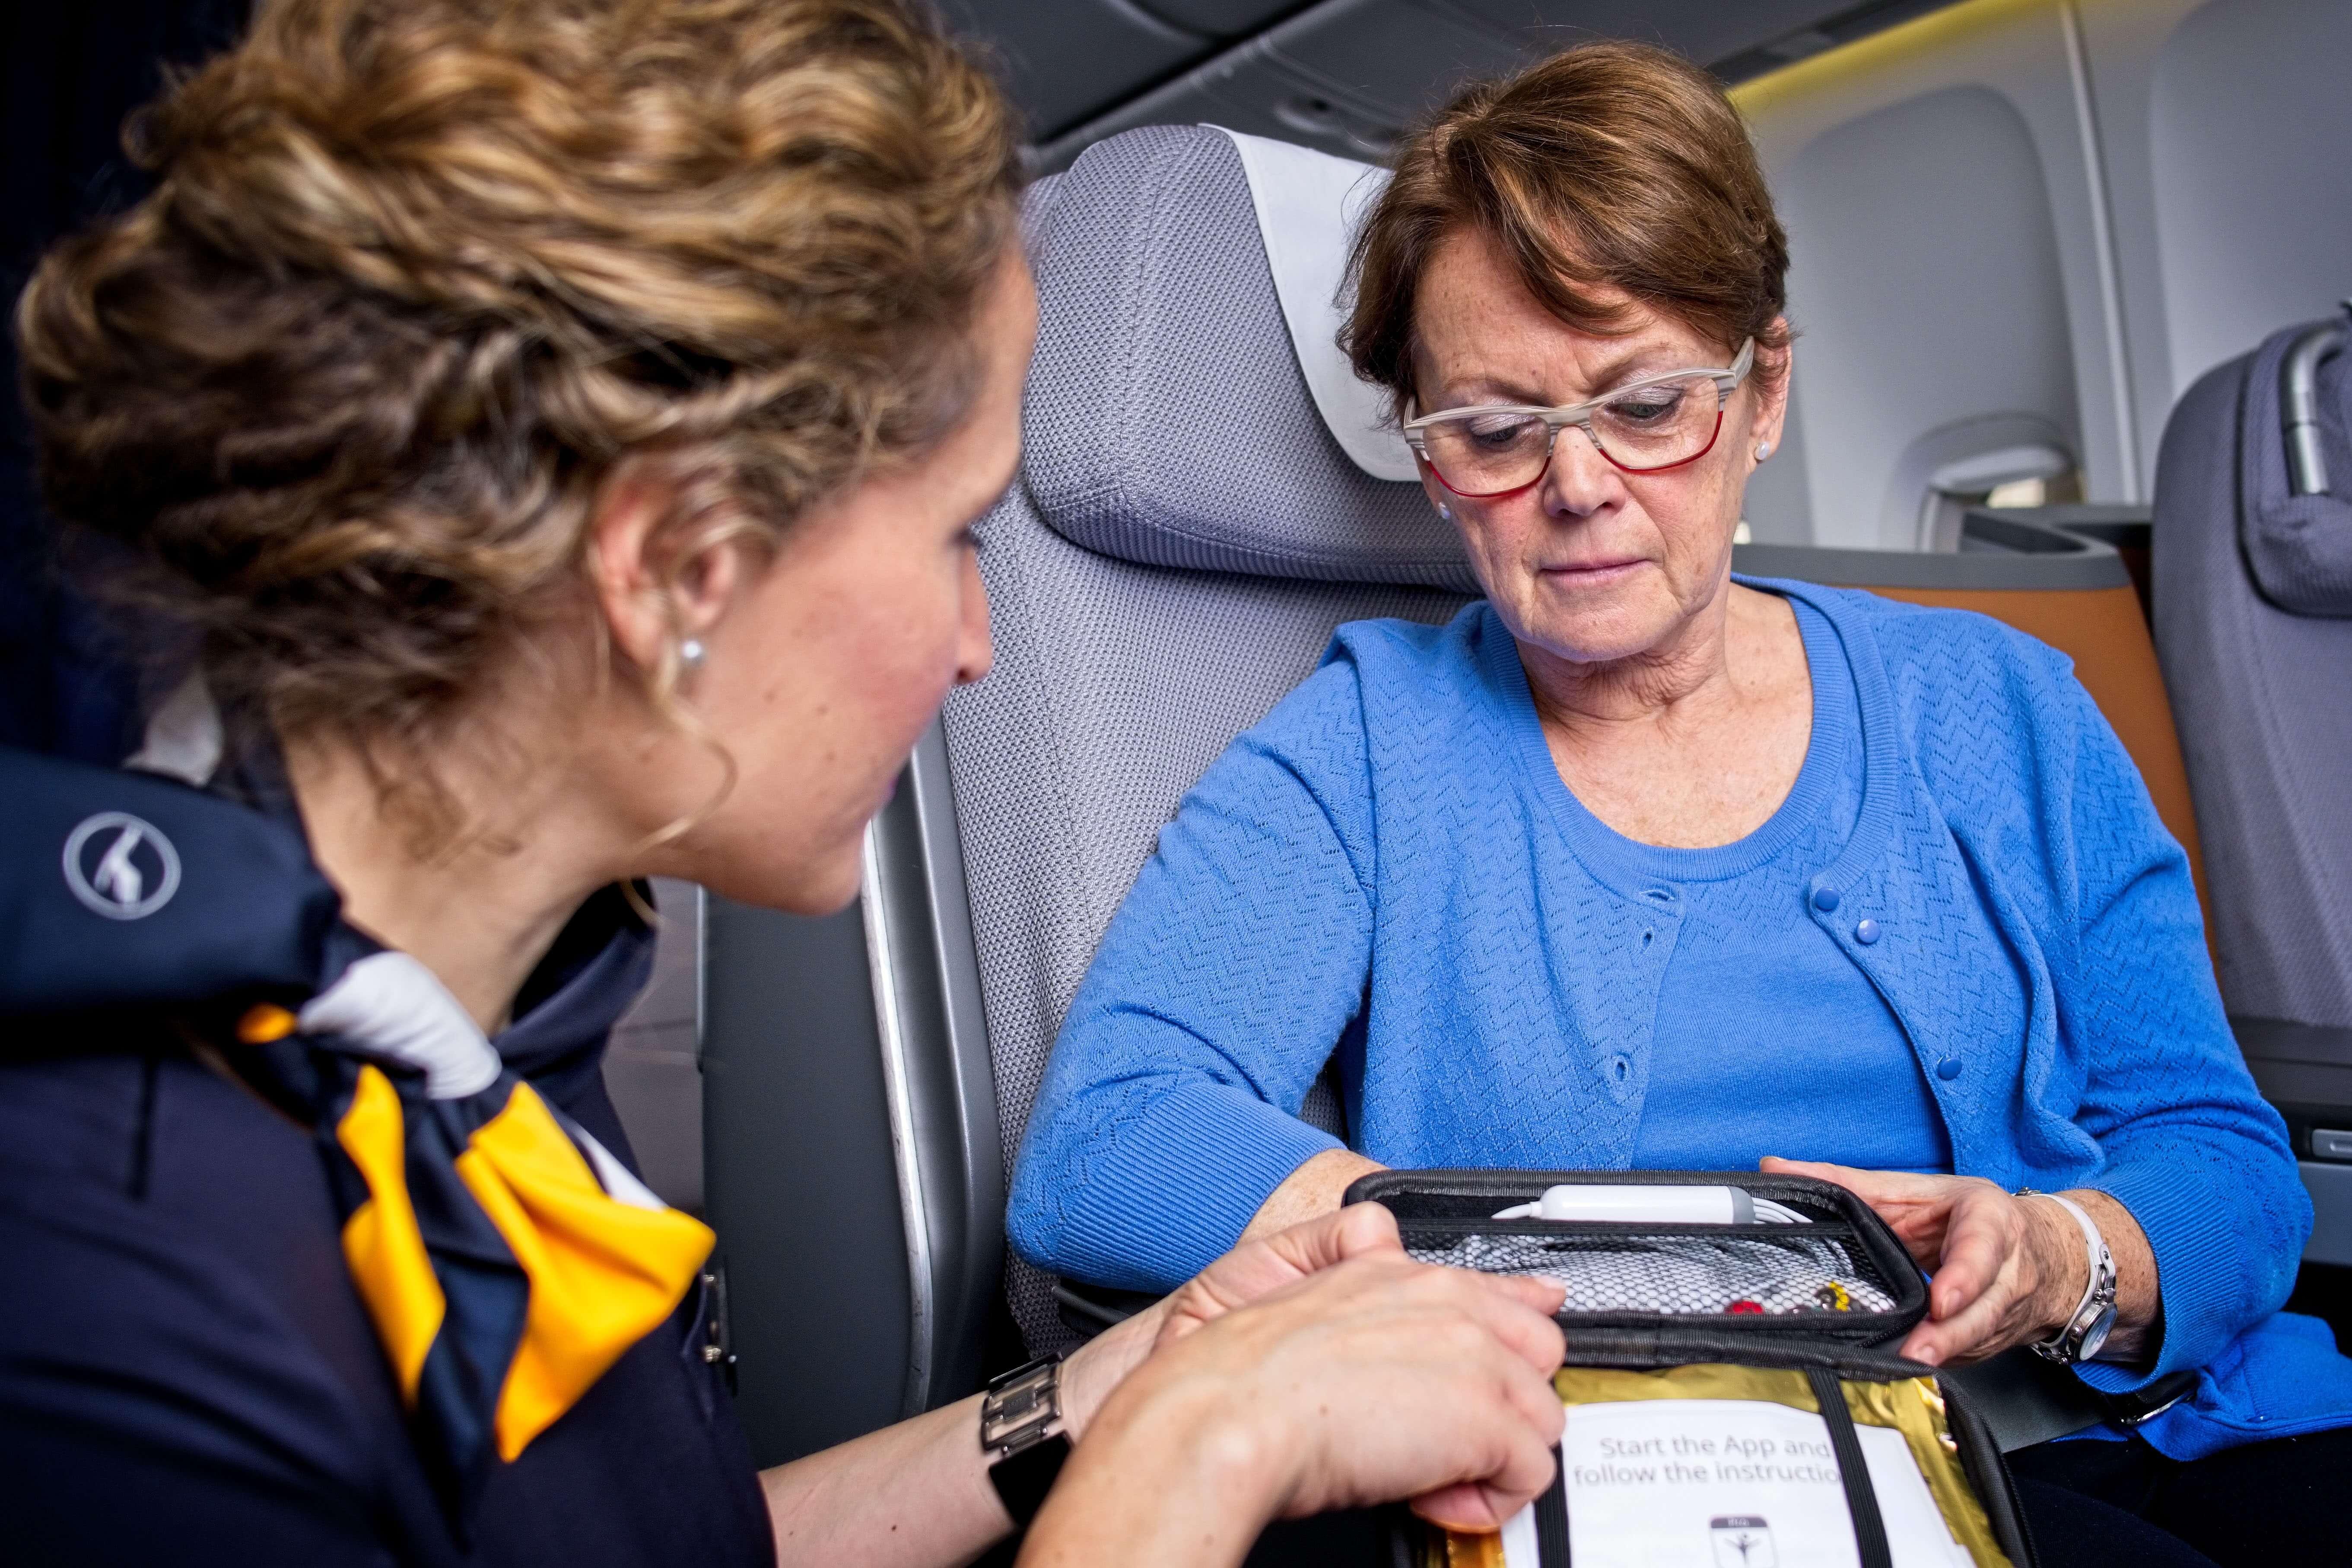 Lufthansa uses telemedicine on board its long-haul fleet